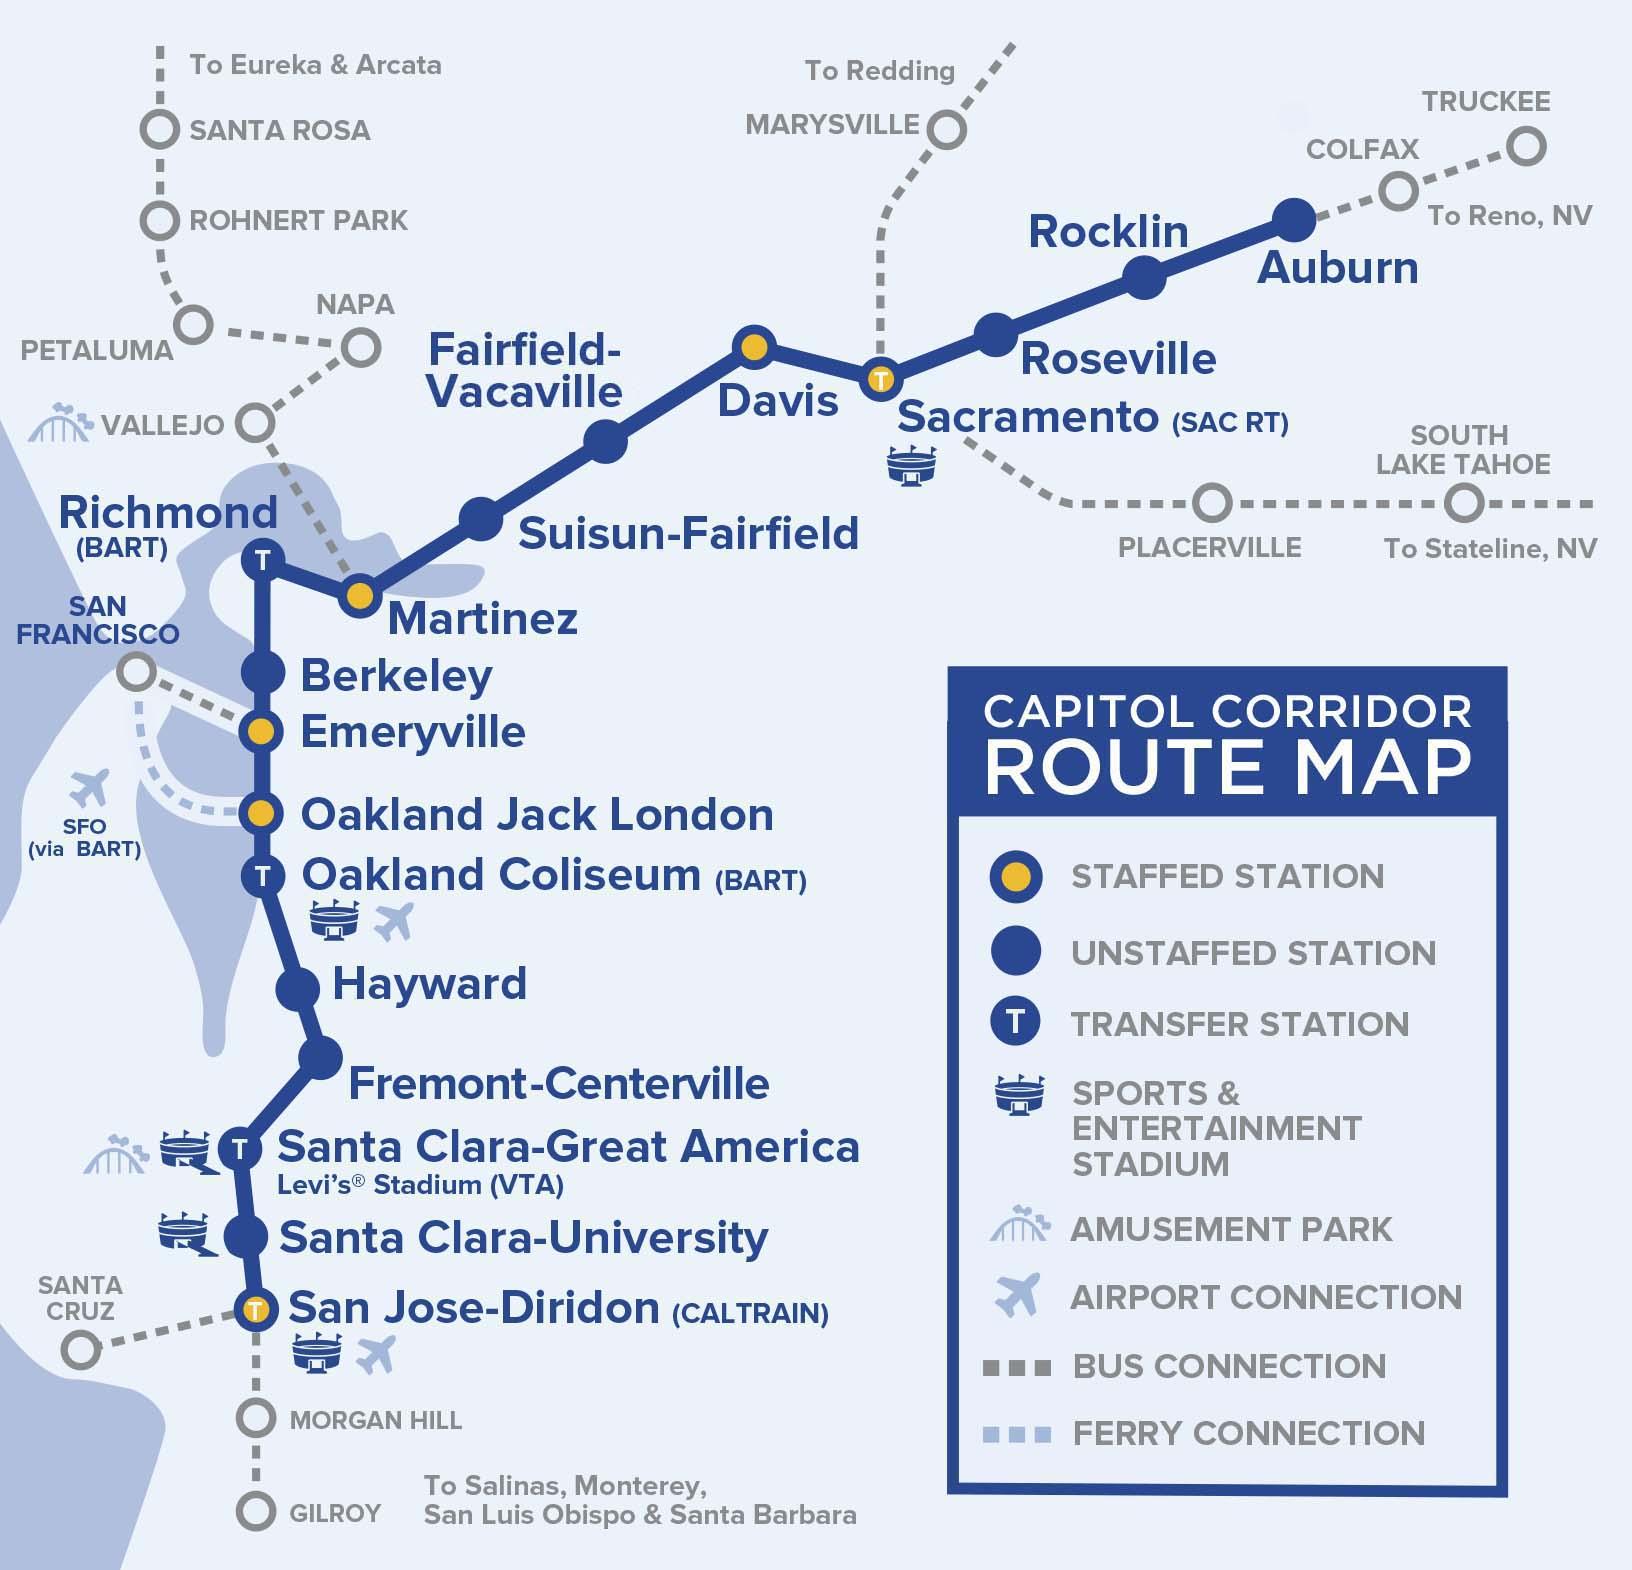 Capital Corridor Train Route Map for Northern California